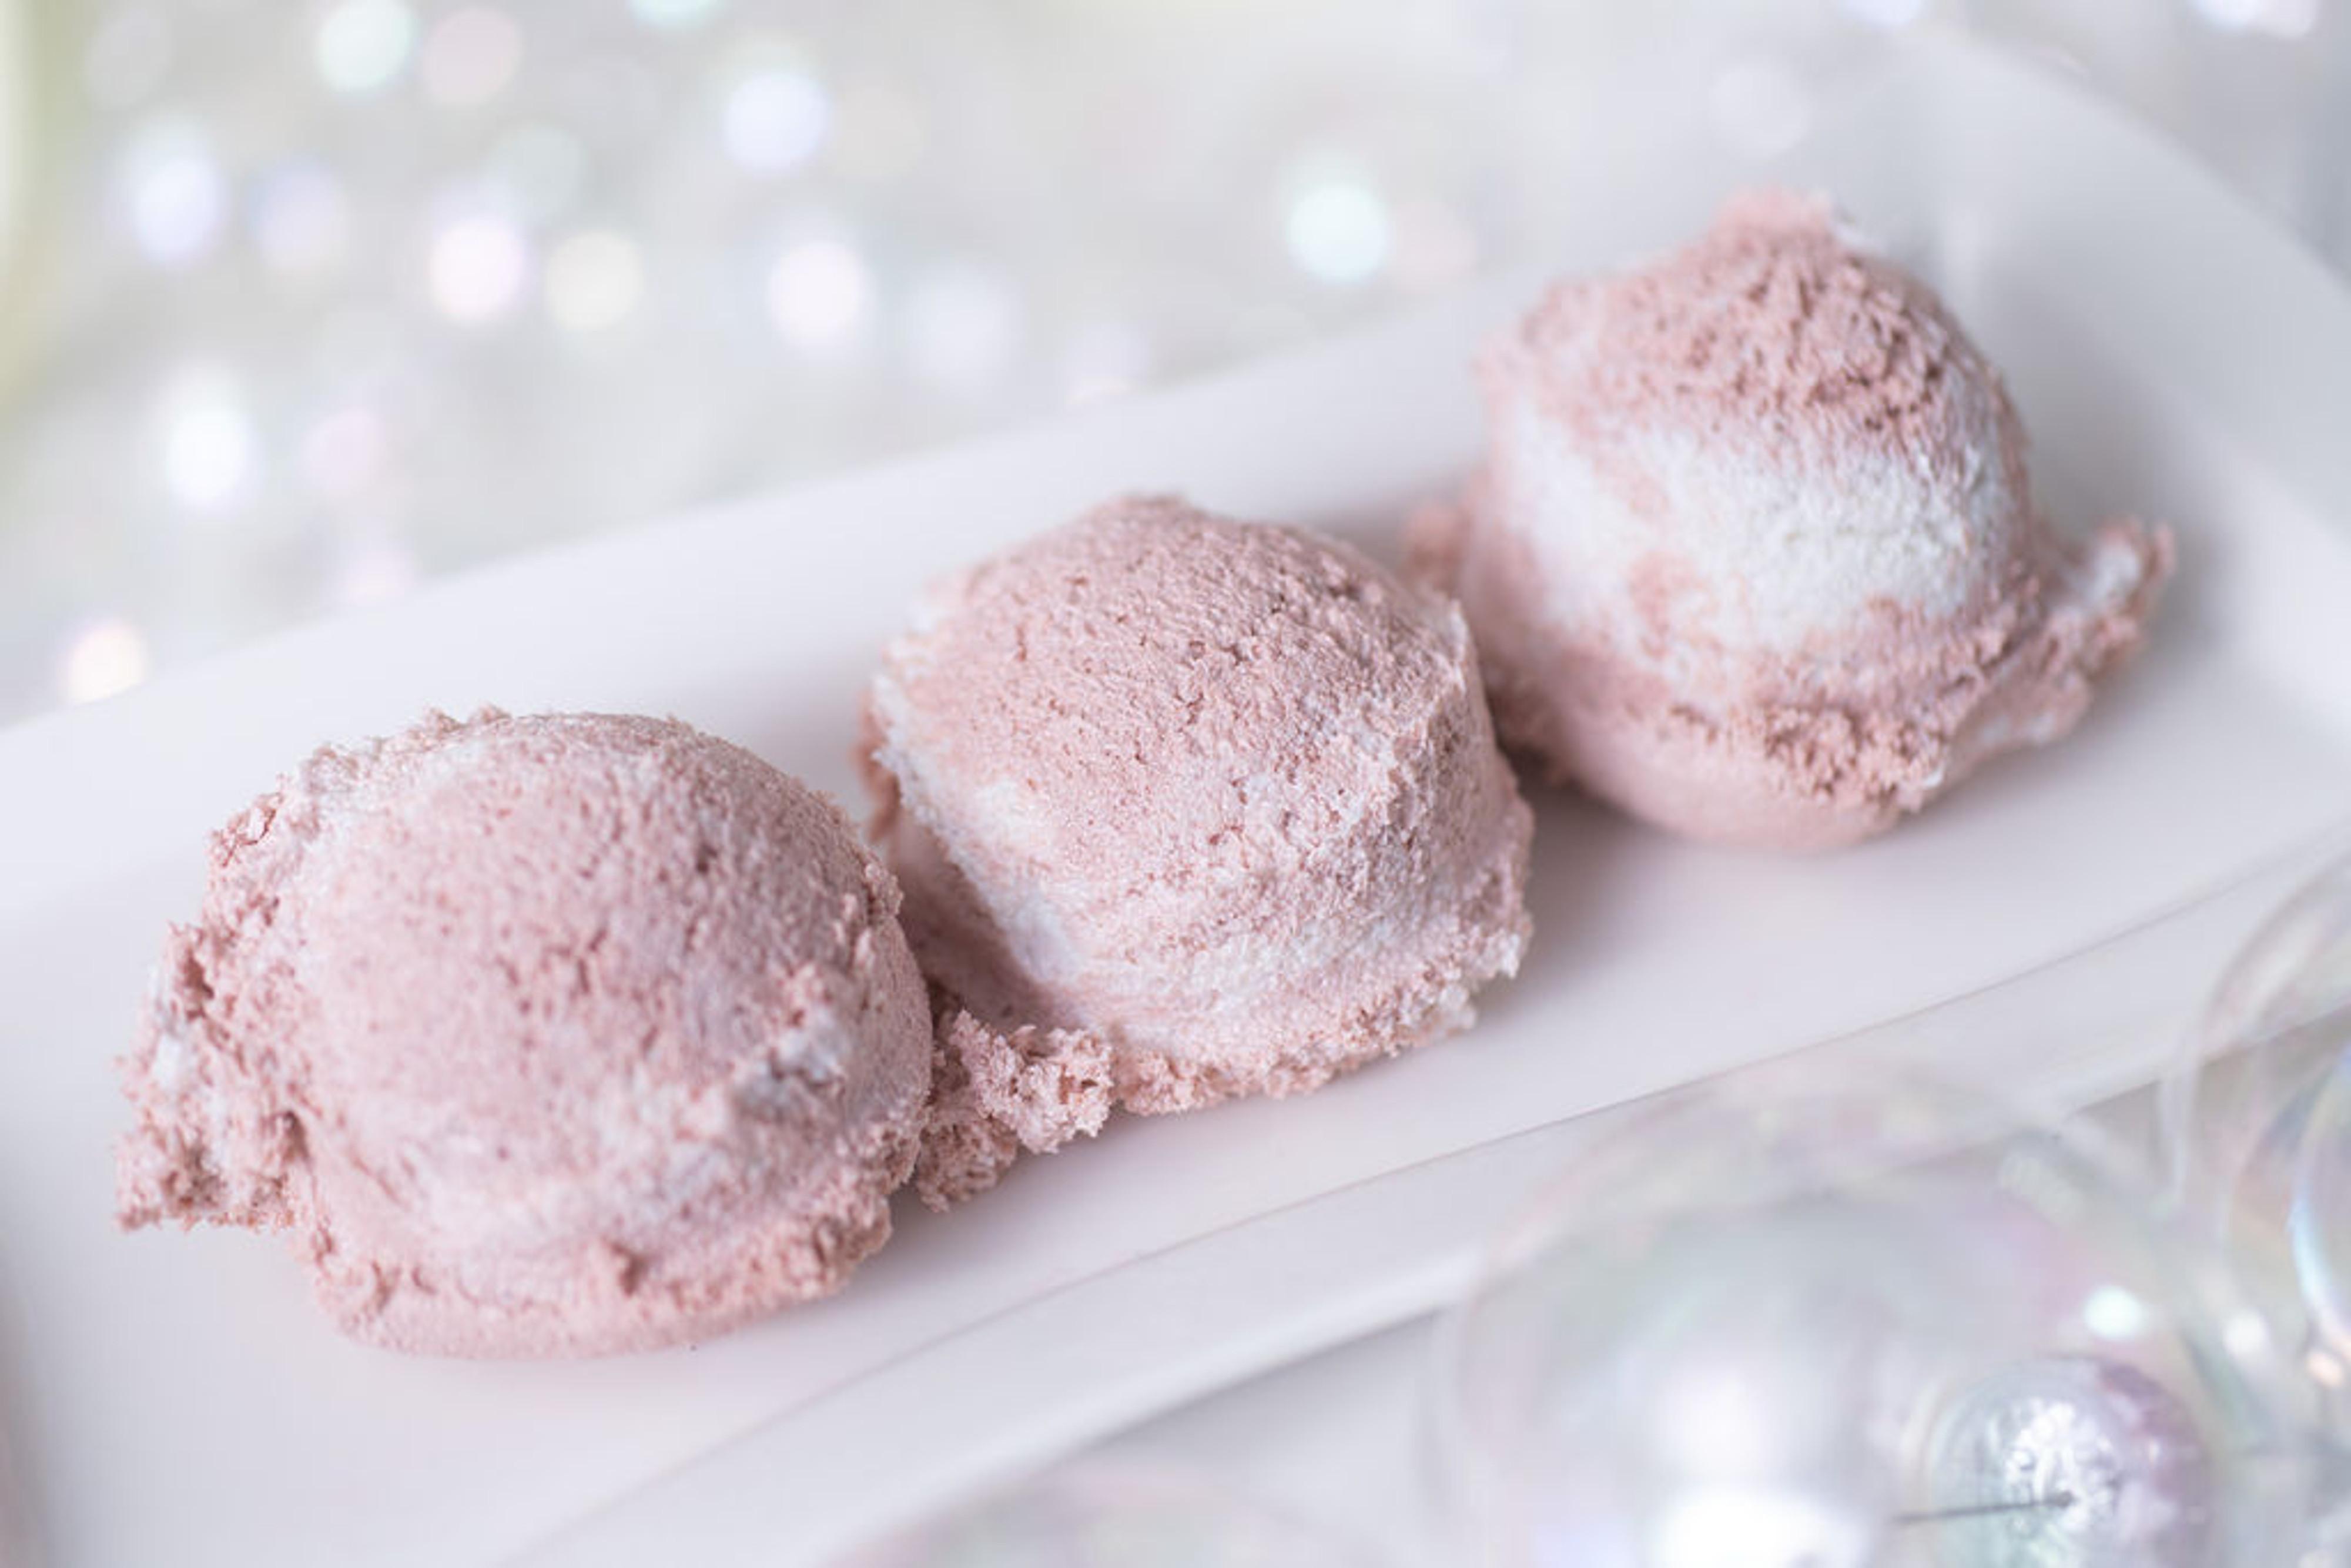 Hazelnut Crema Gelato Lathering Sugar Scrub